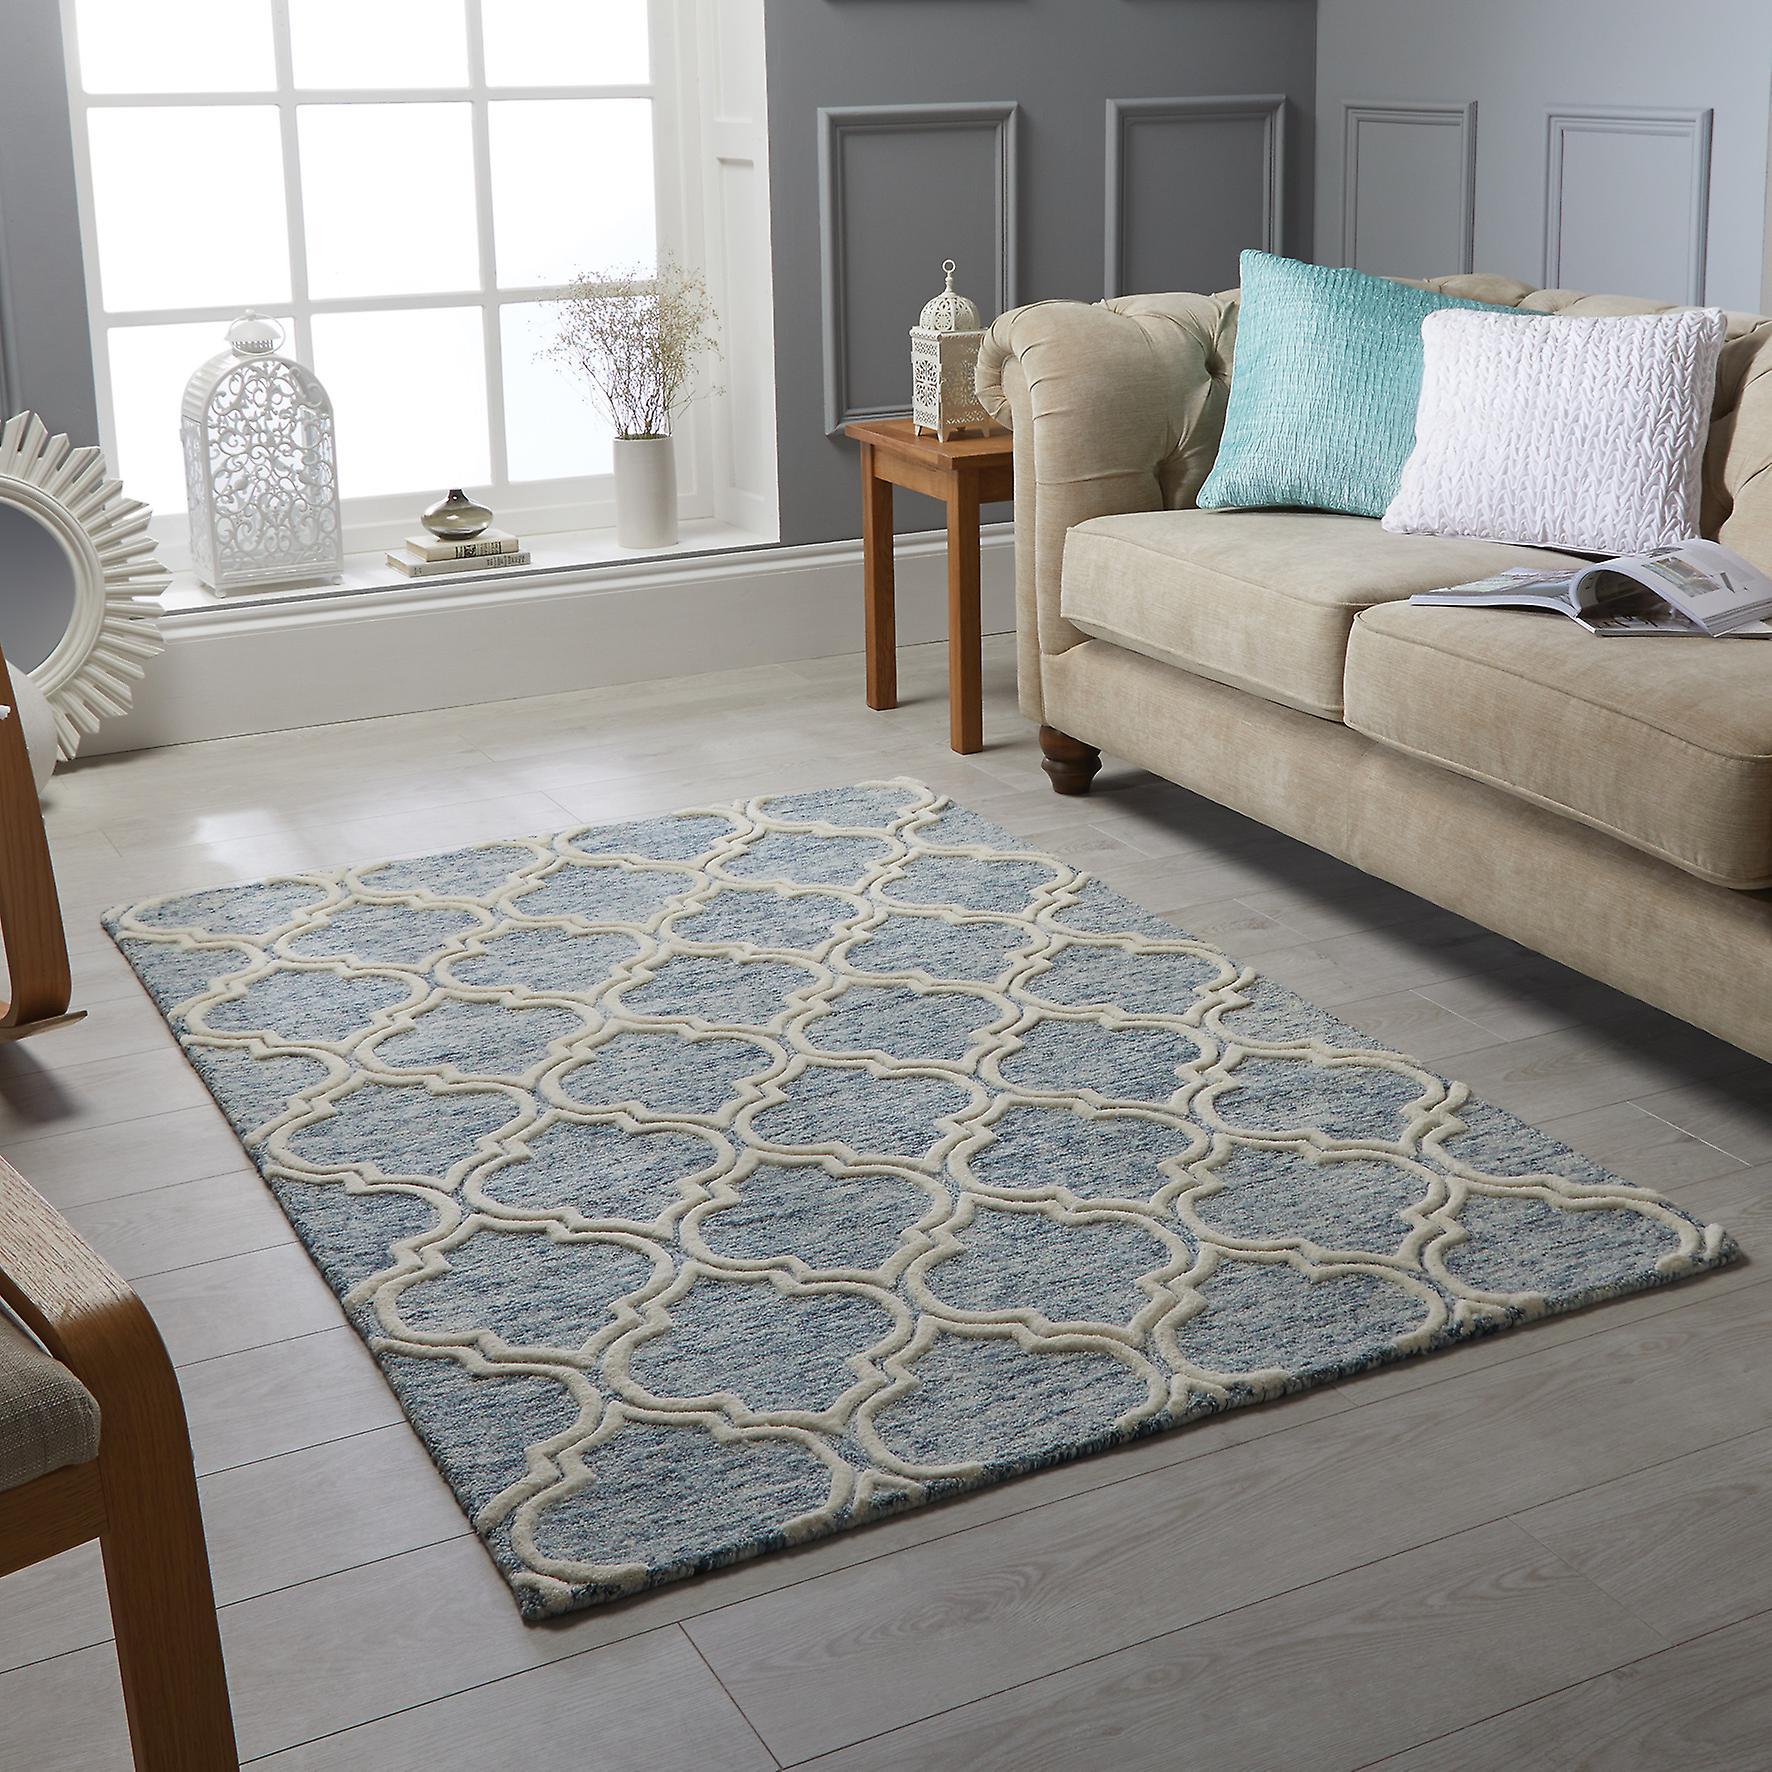 Tapis Medina tisserands bleu Rectangle tapis Plain presque ordinaire